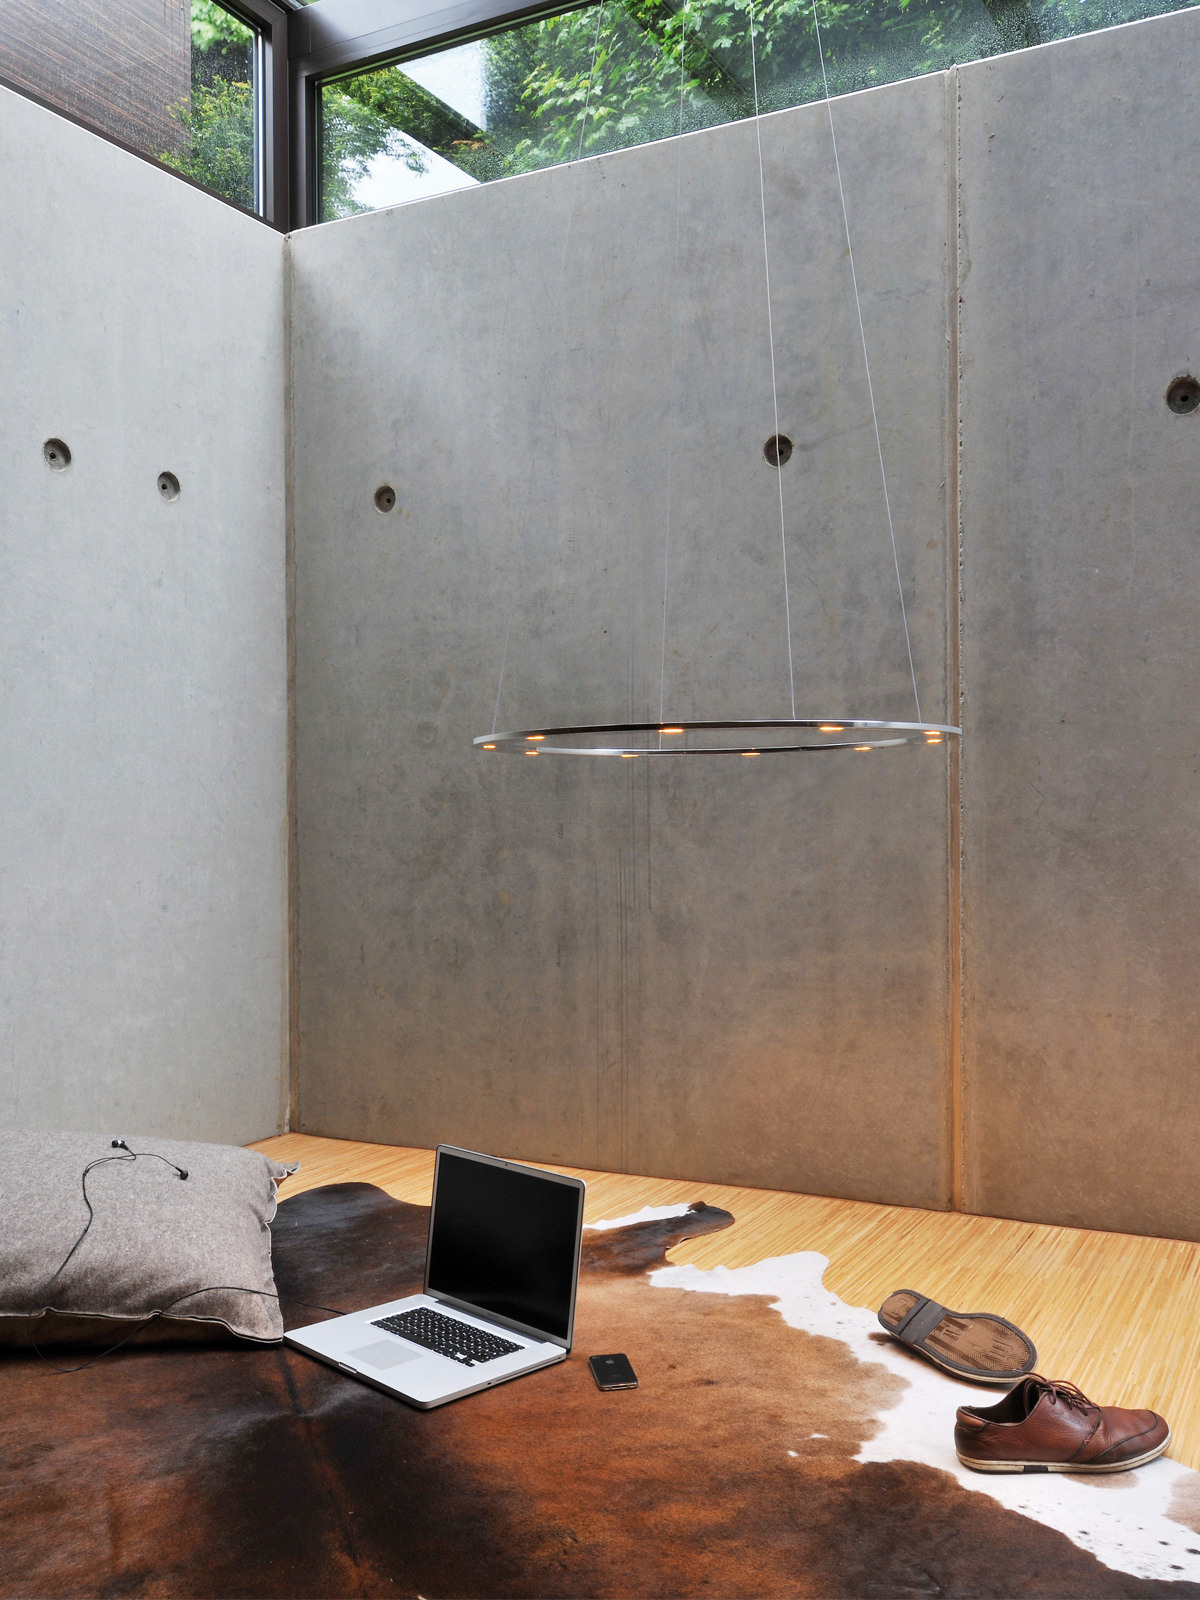 Designort Blog: Piani Rondo BYOK